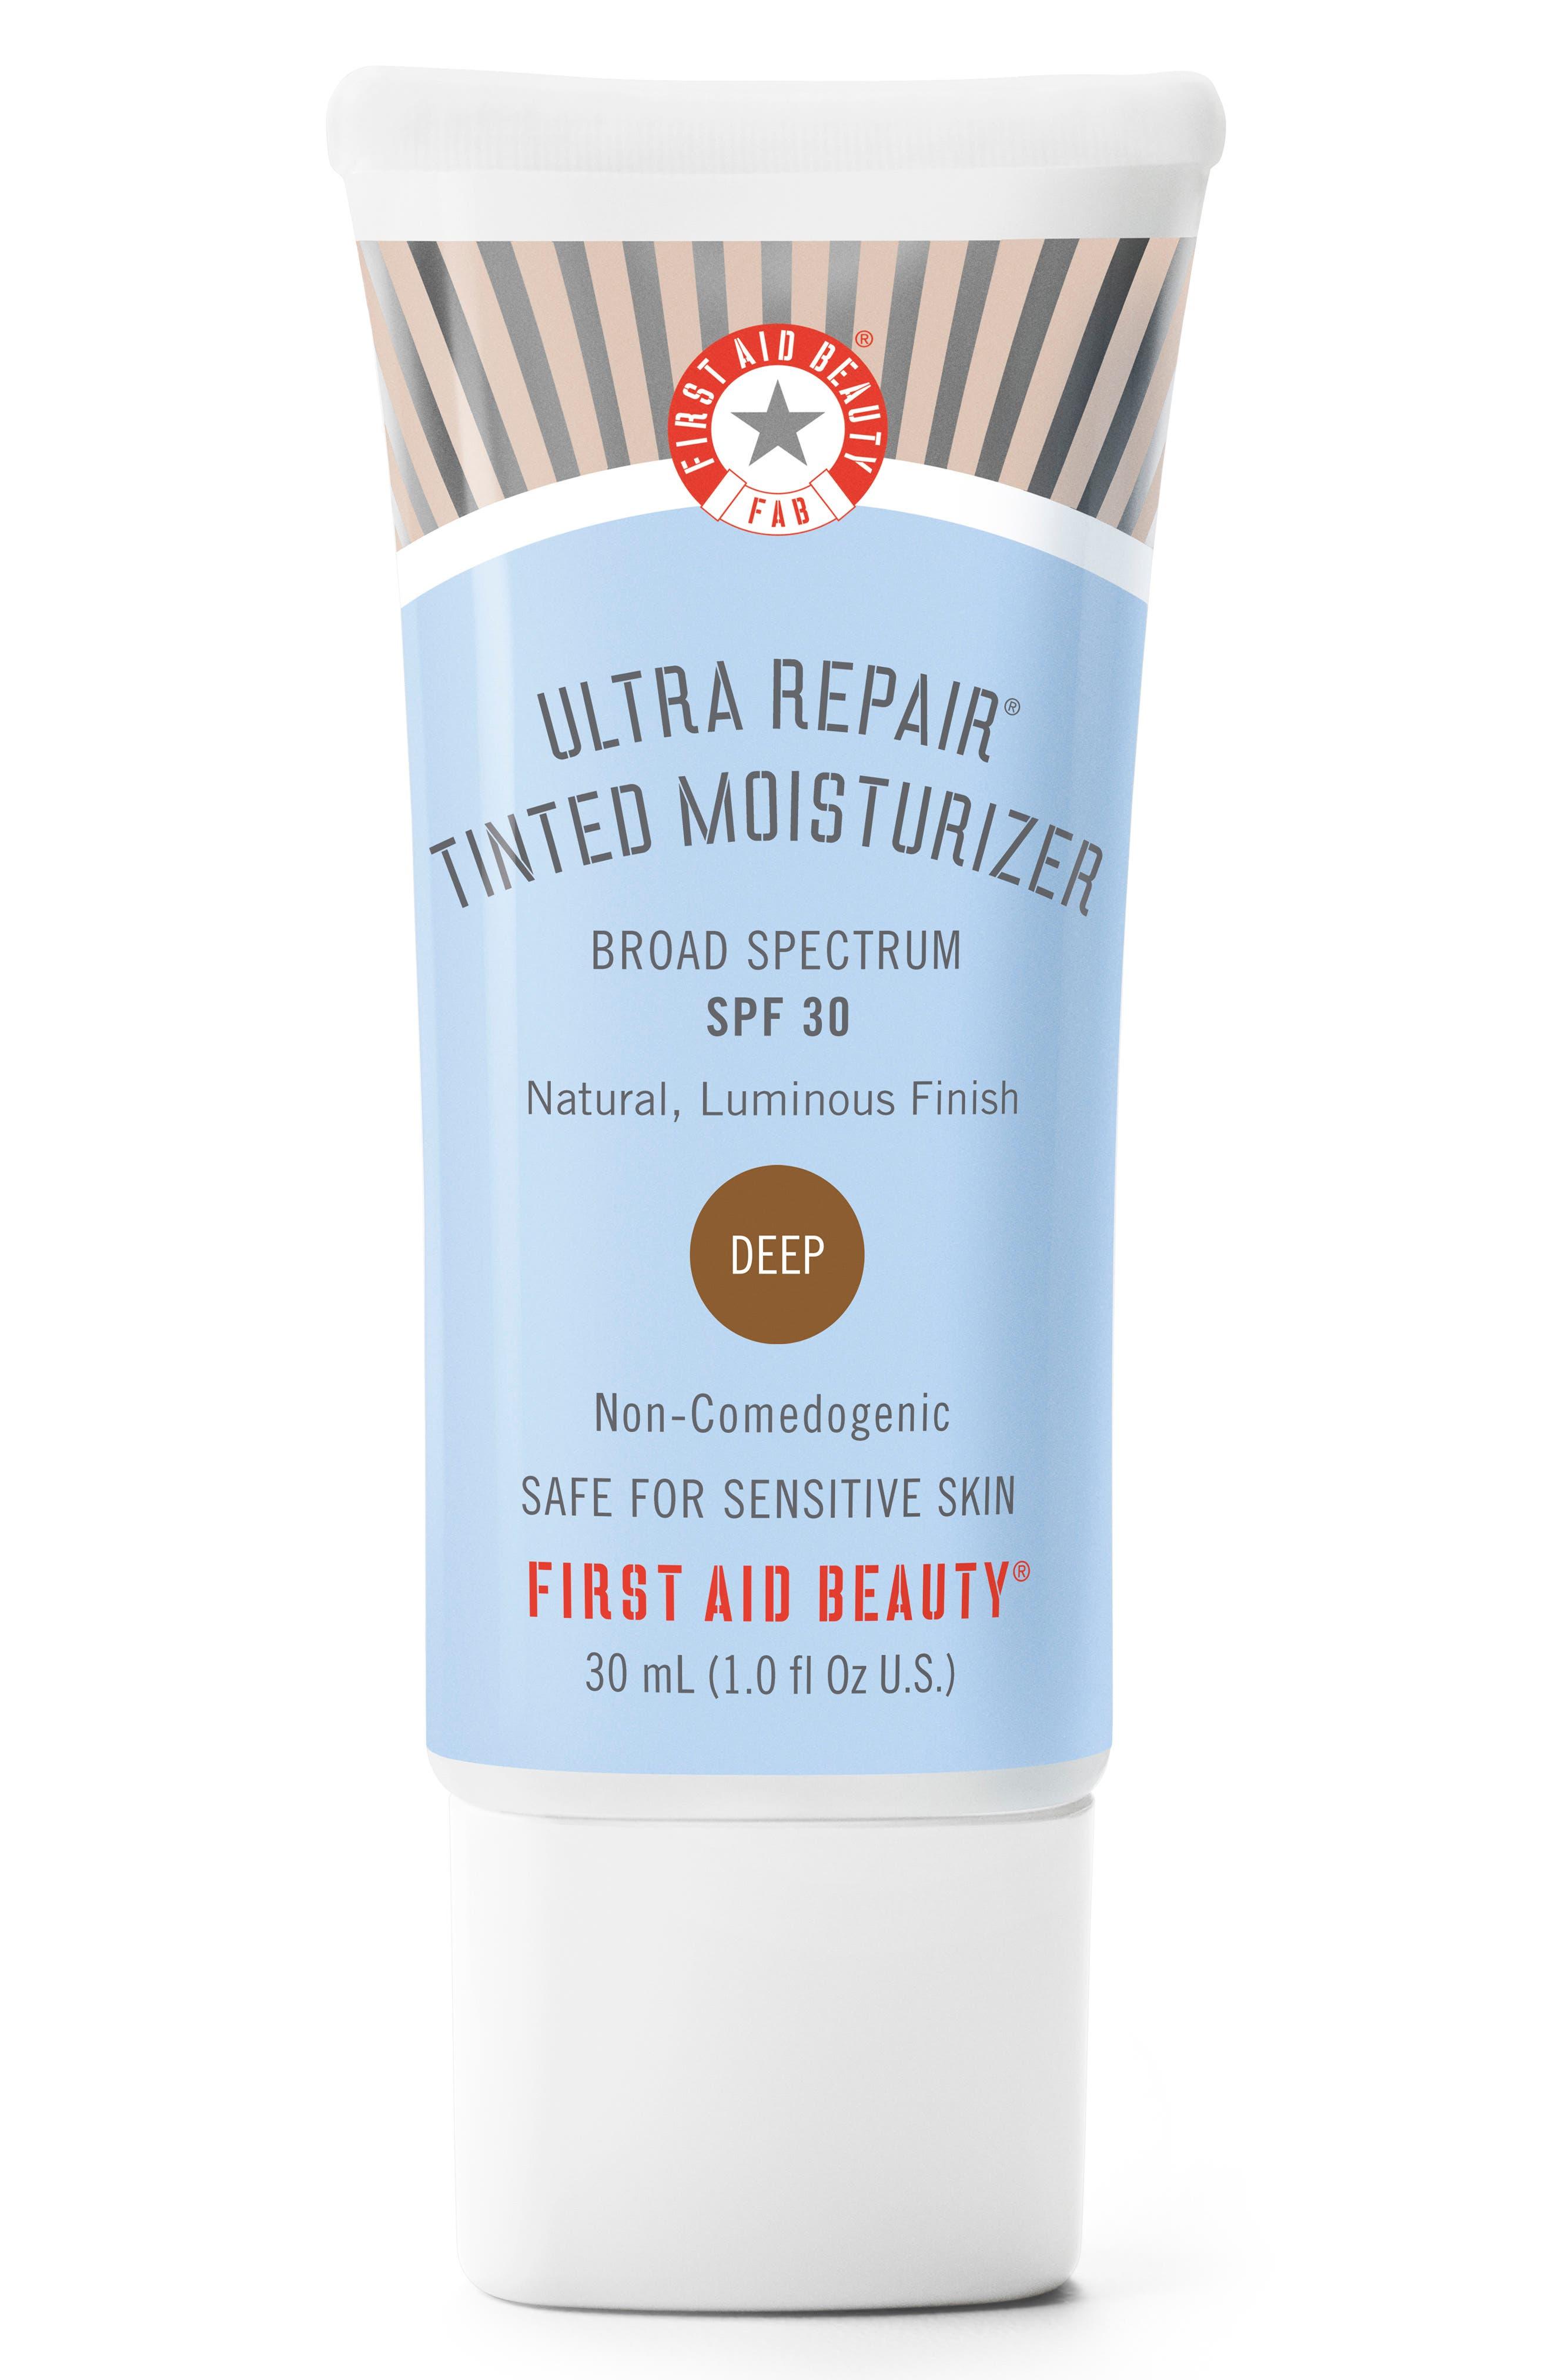 Ultra Repair Tinted Moisturizer Broad Spectrum Spf 30